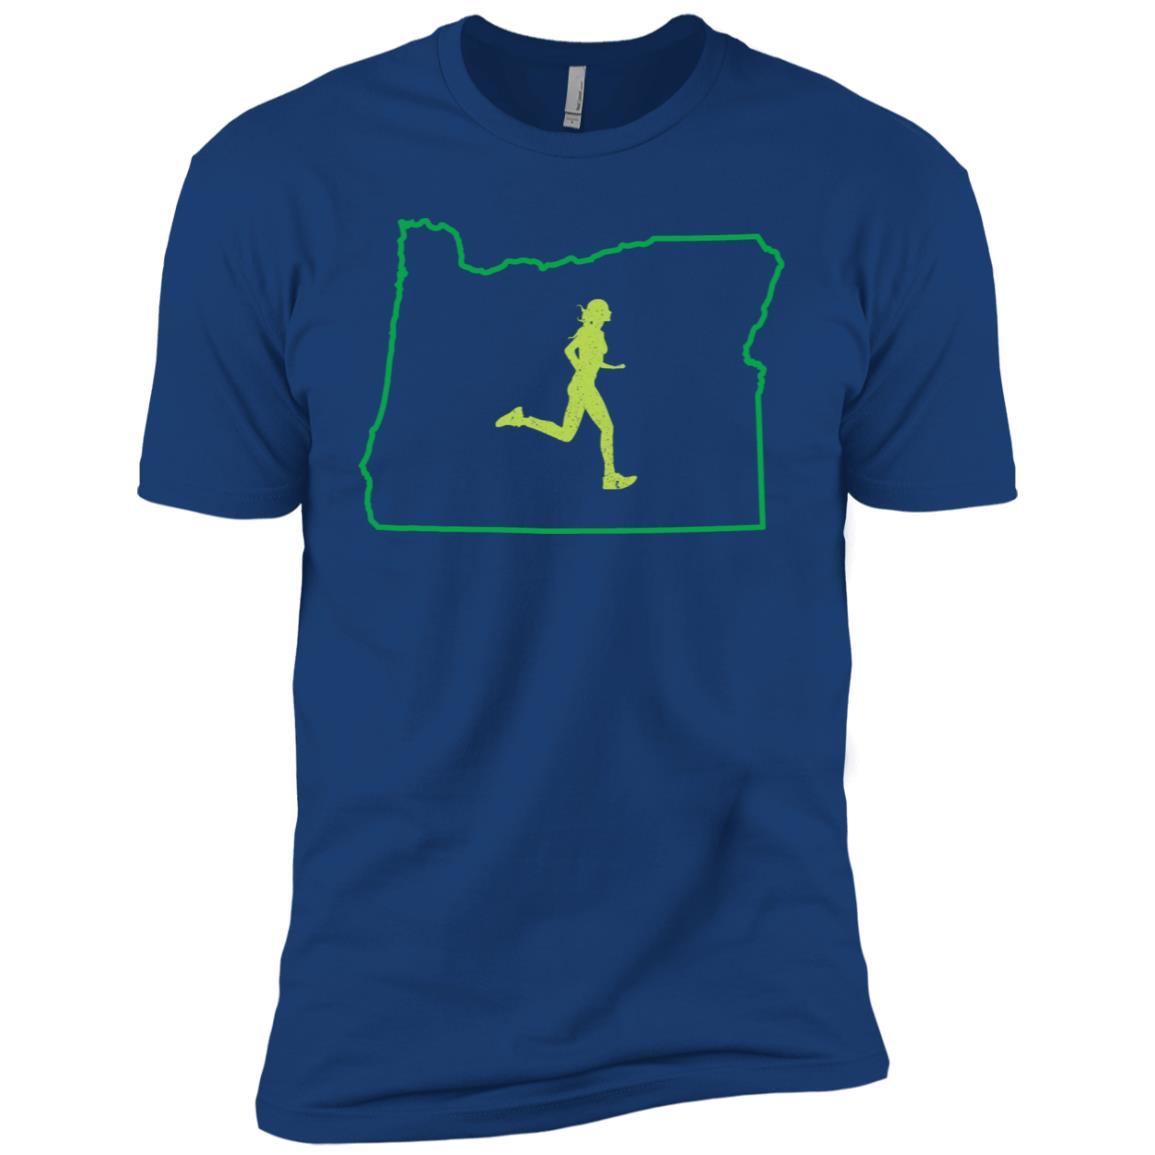 Run Oregon Oregonian Girls Womens Running Gifts Men Short Sleeve T-Shirt